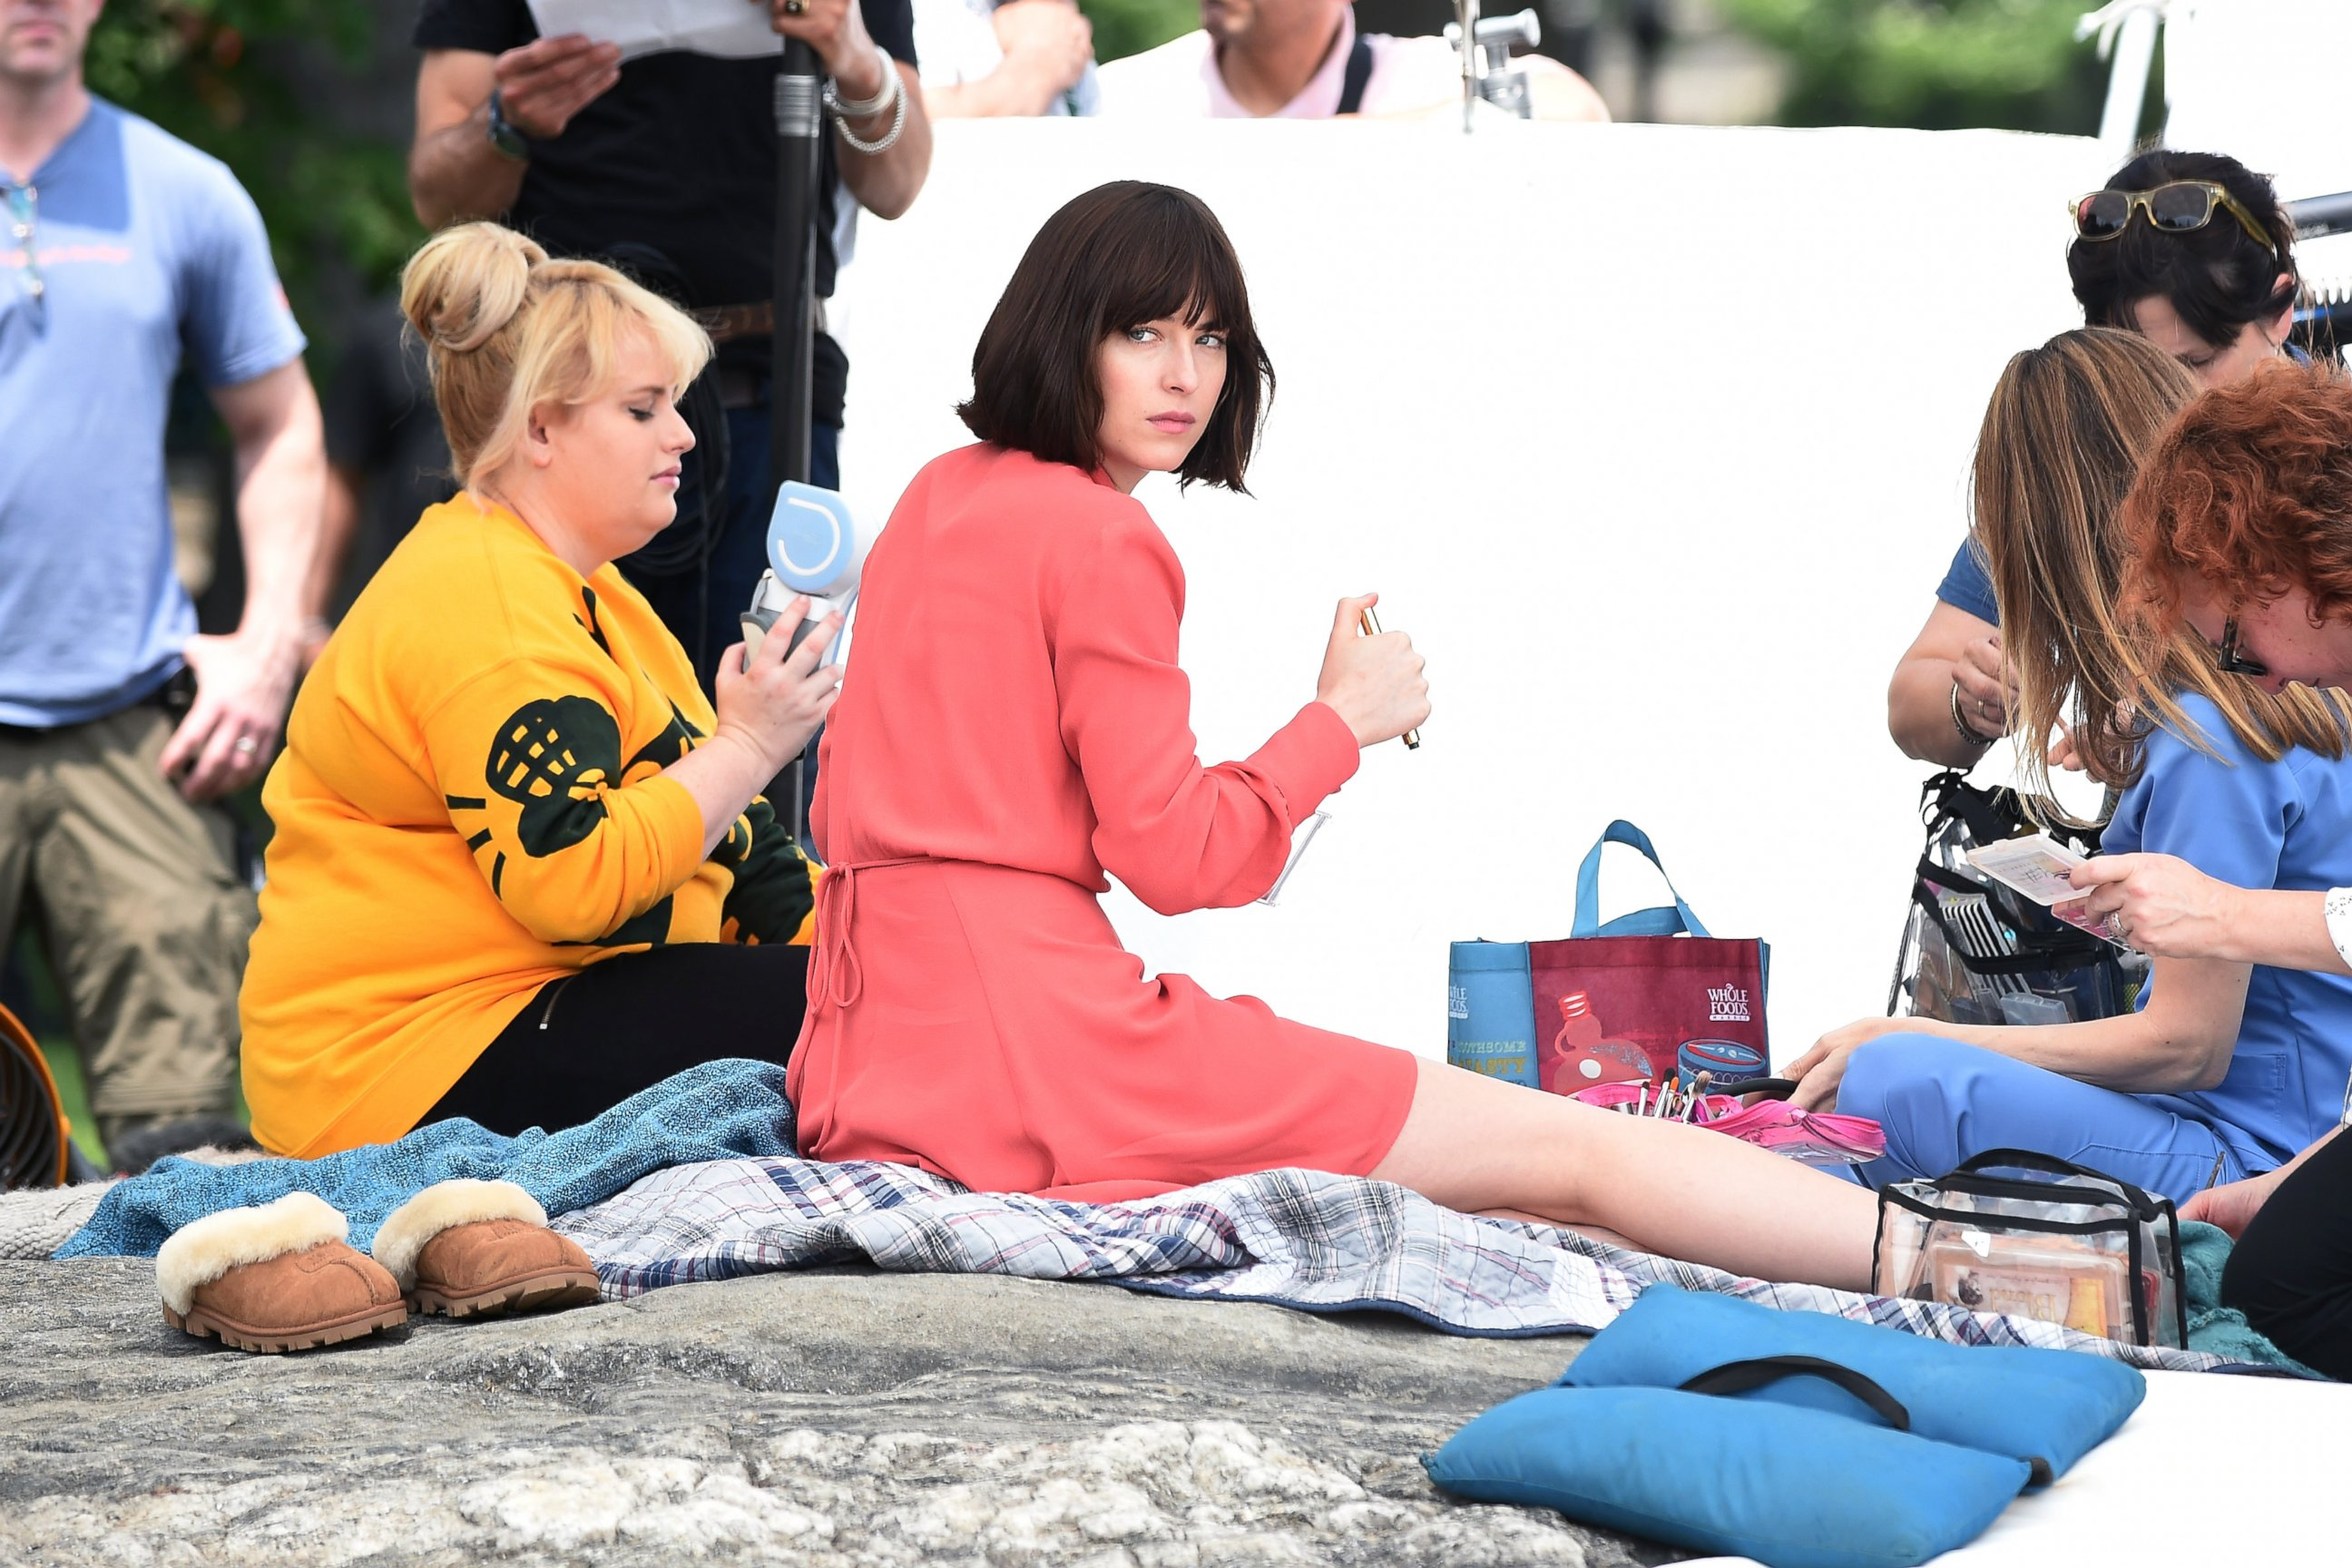 Rebel Wilson and Dakota Johnson Get to Work on a New Film